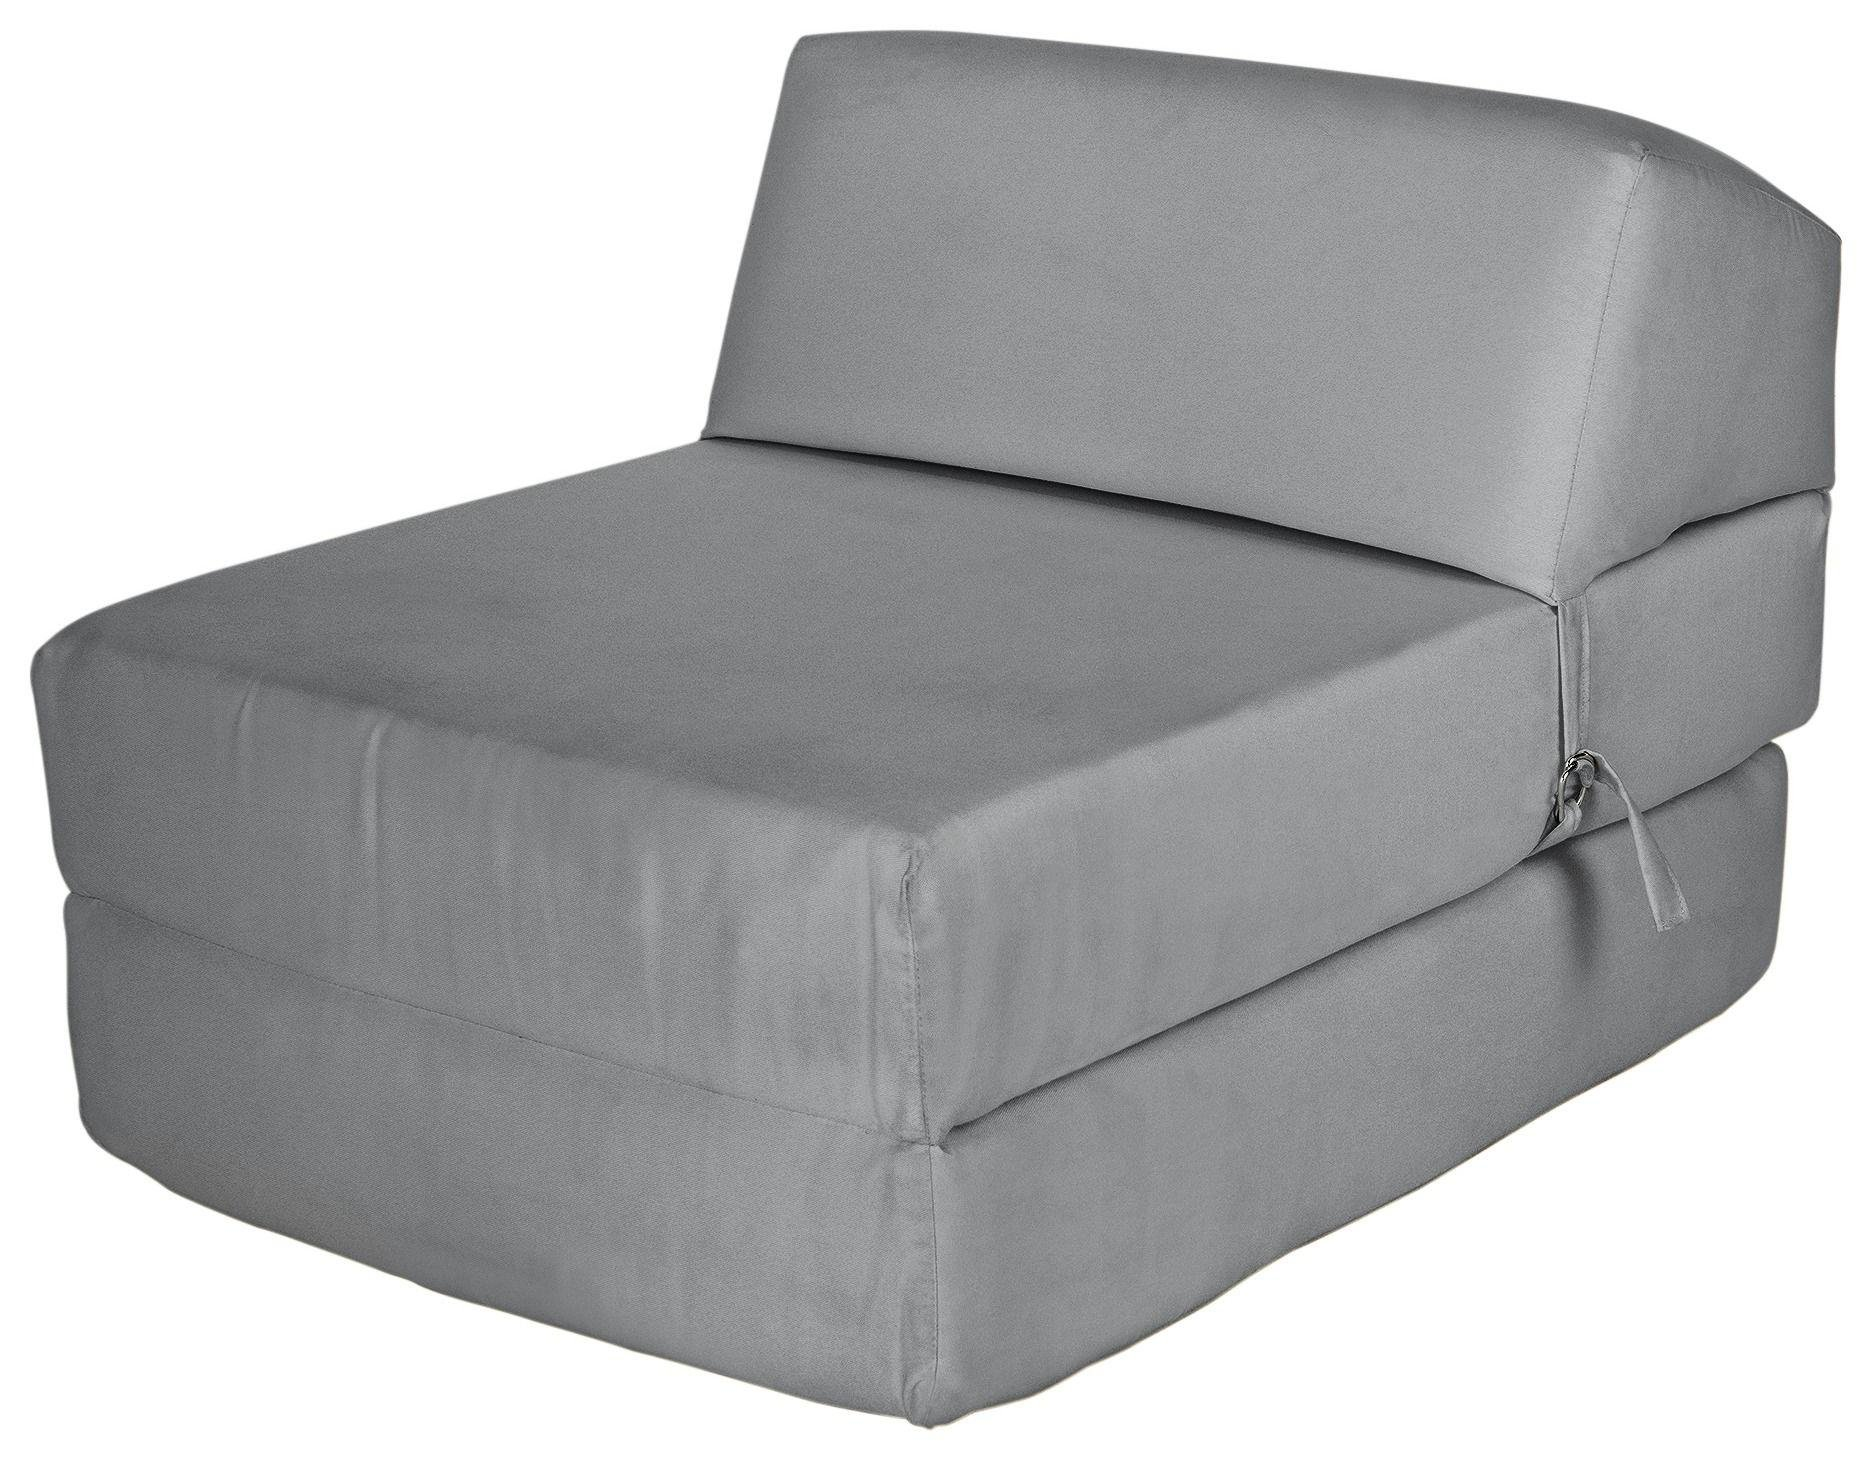 Argos Home Single Cotton Chairbed - Flint Grey